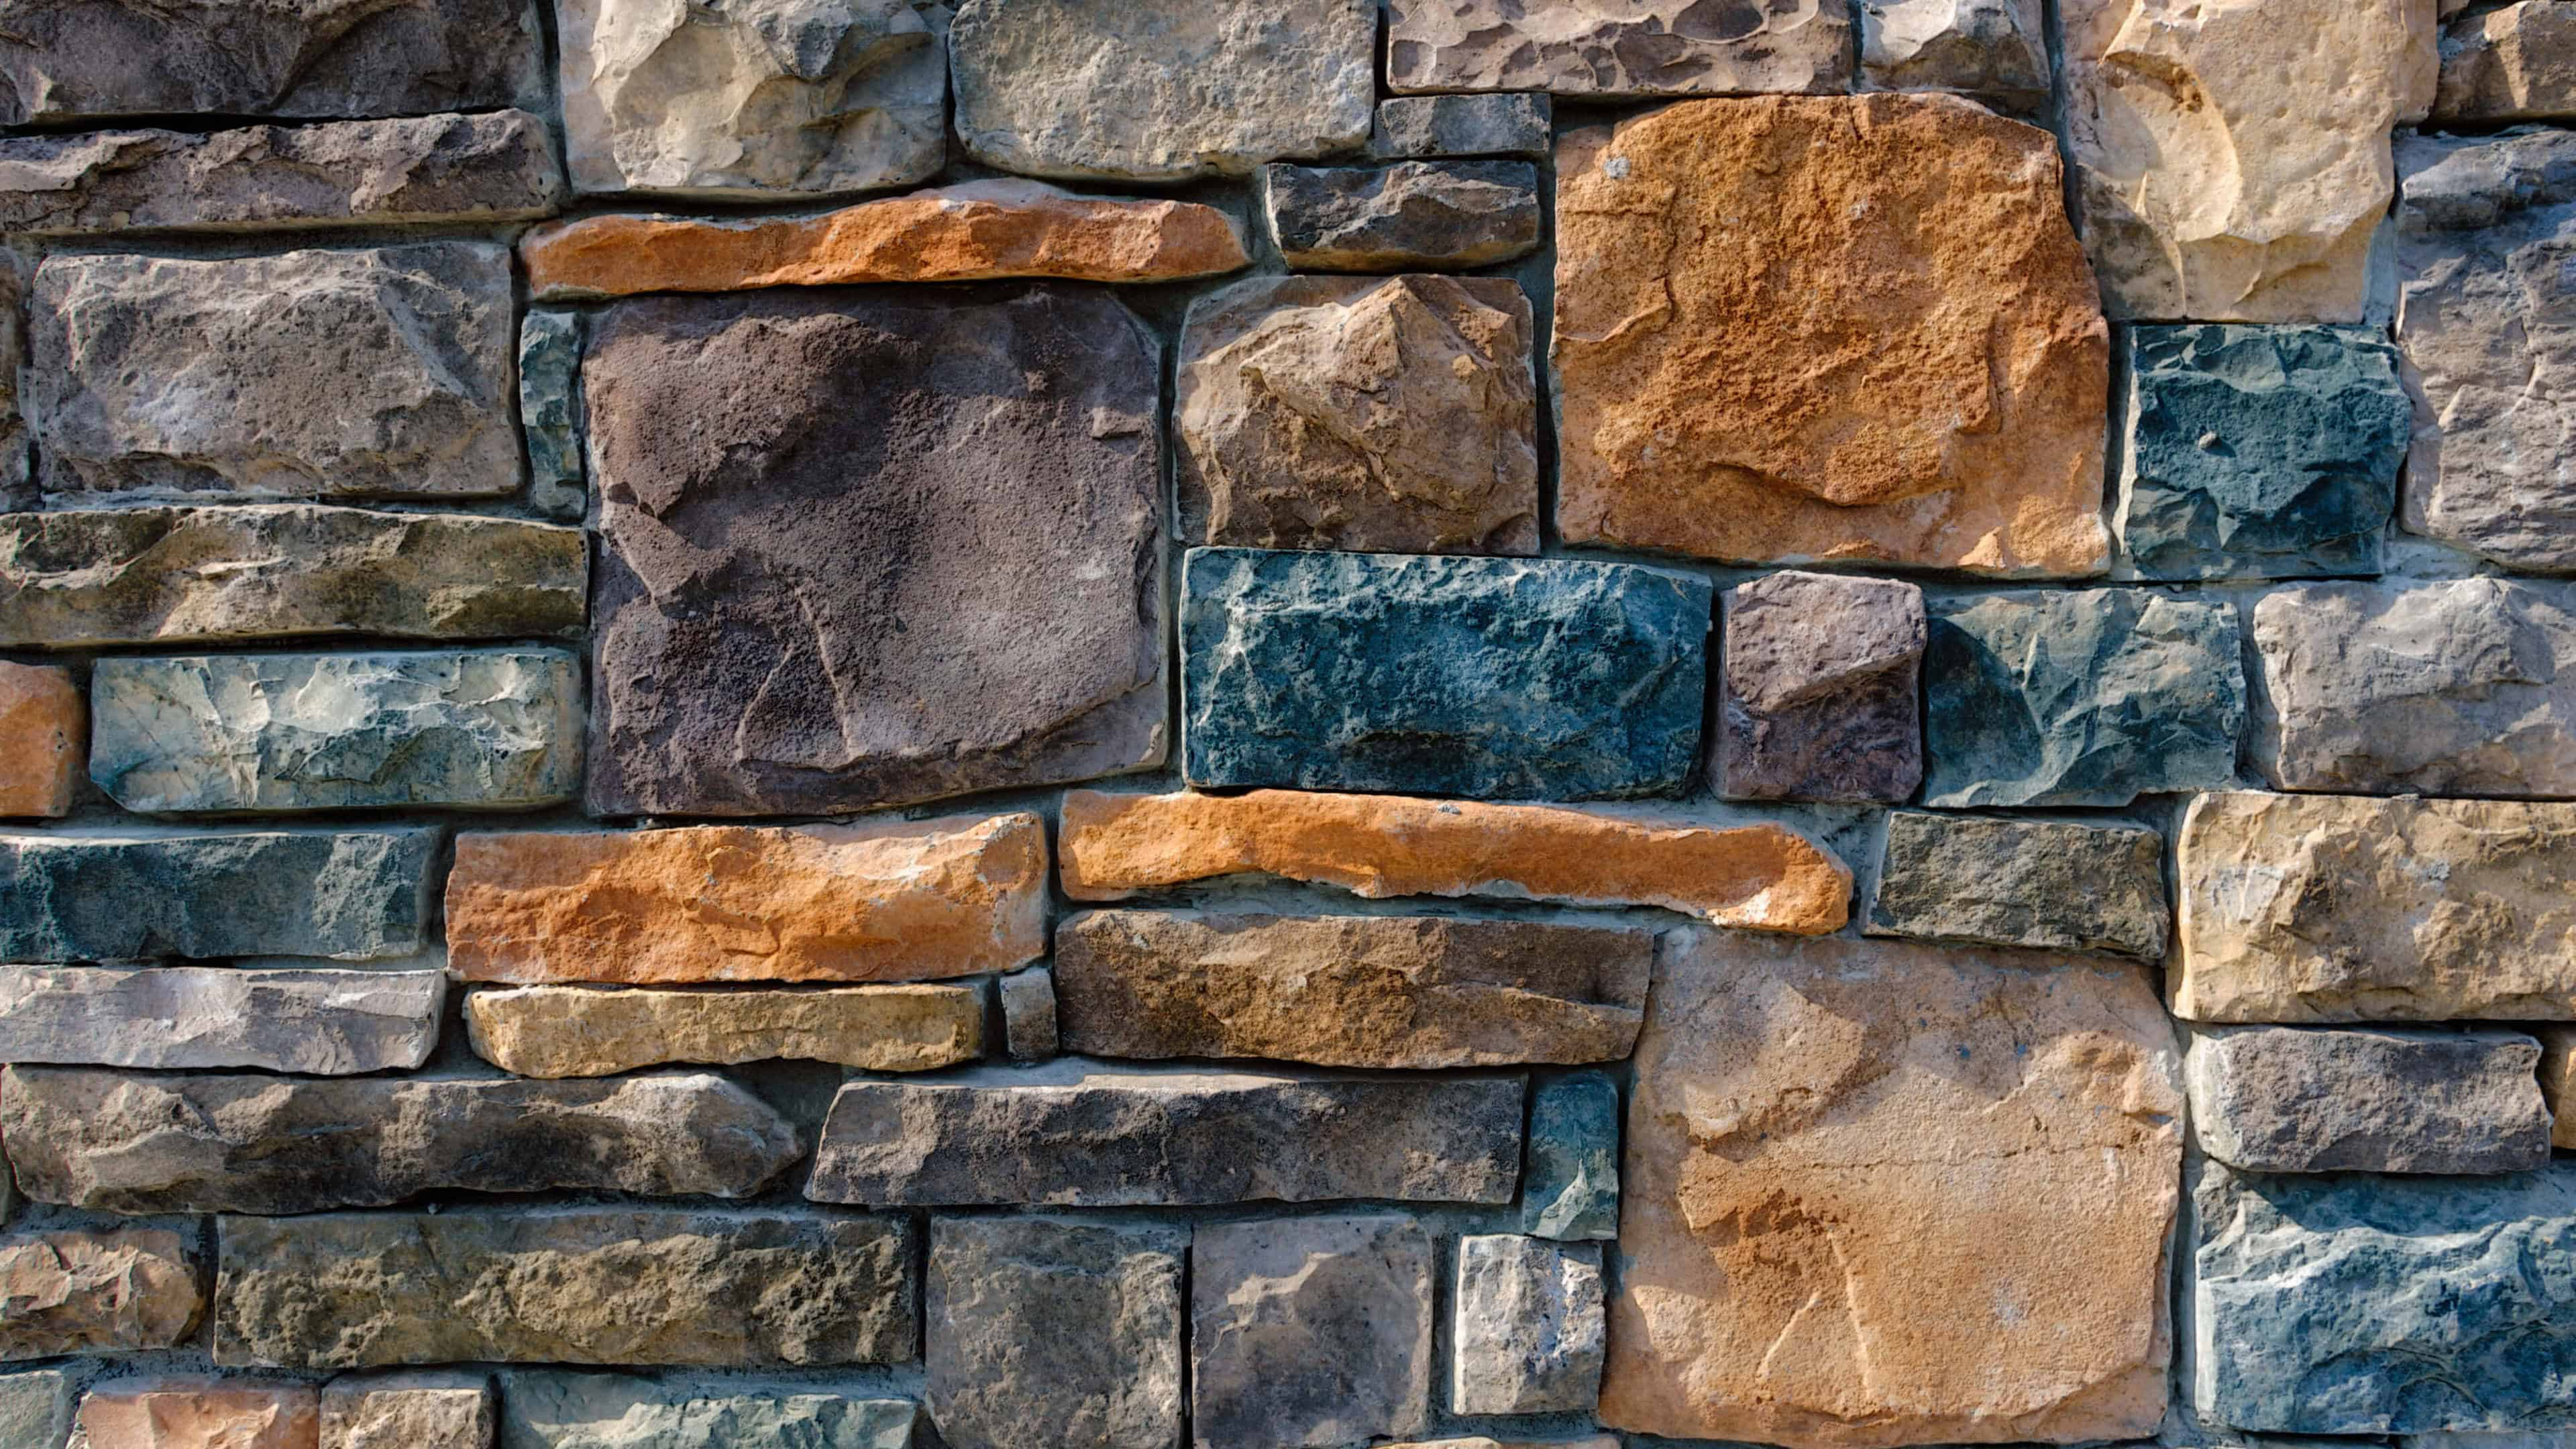 Cars Photos Hd Wallpaper Stone Wall Uhd 4k Wallpaper Pixelz